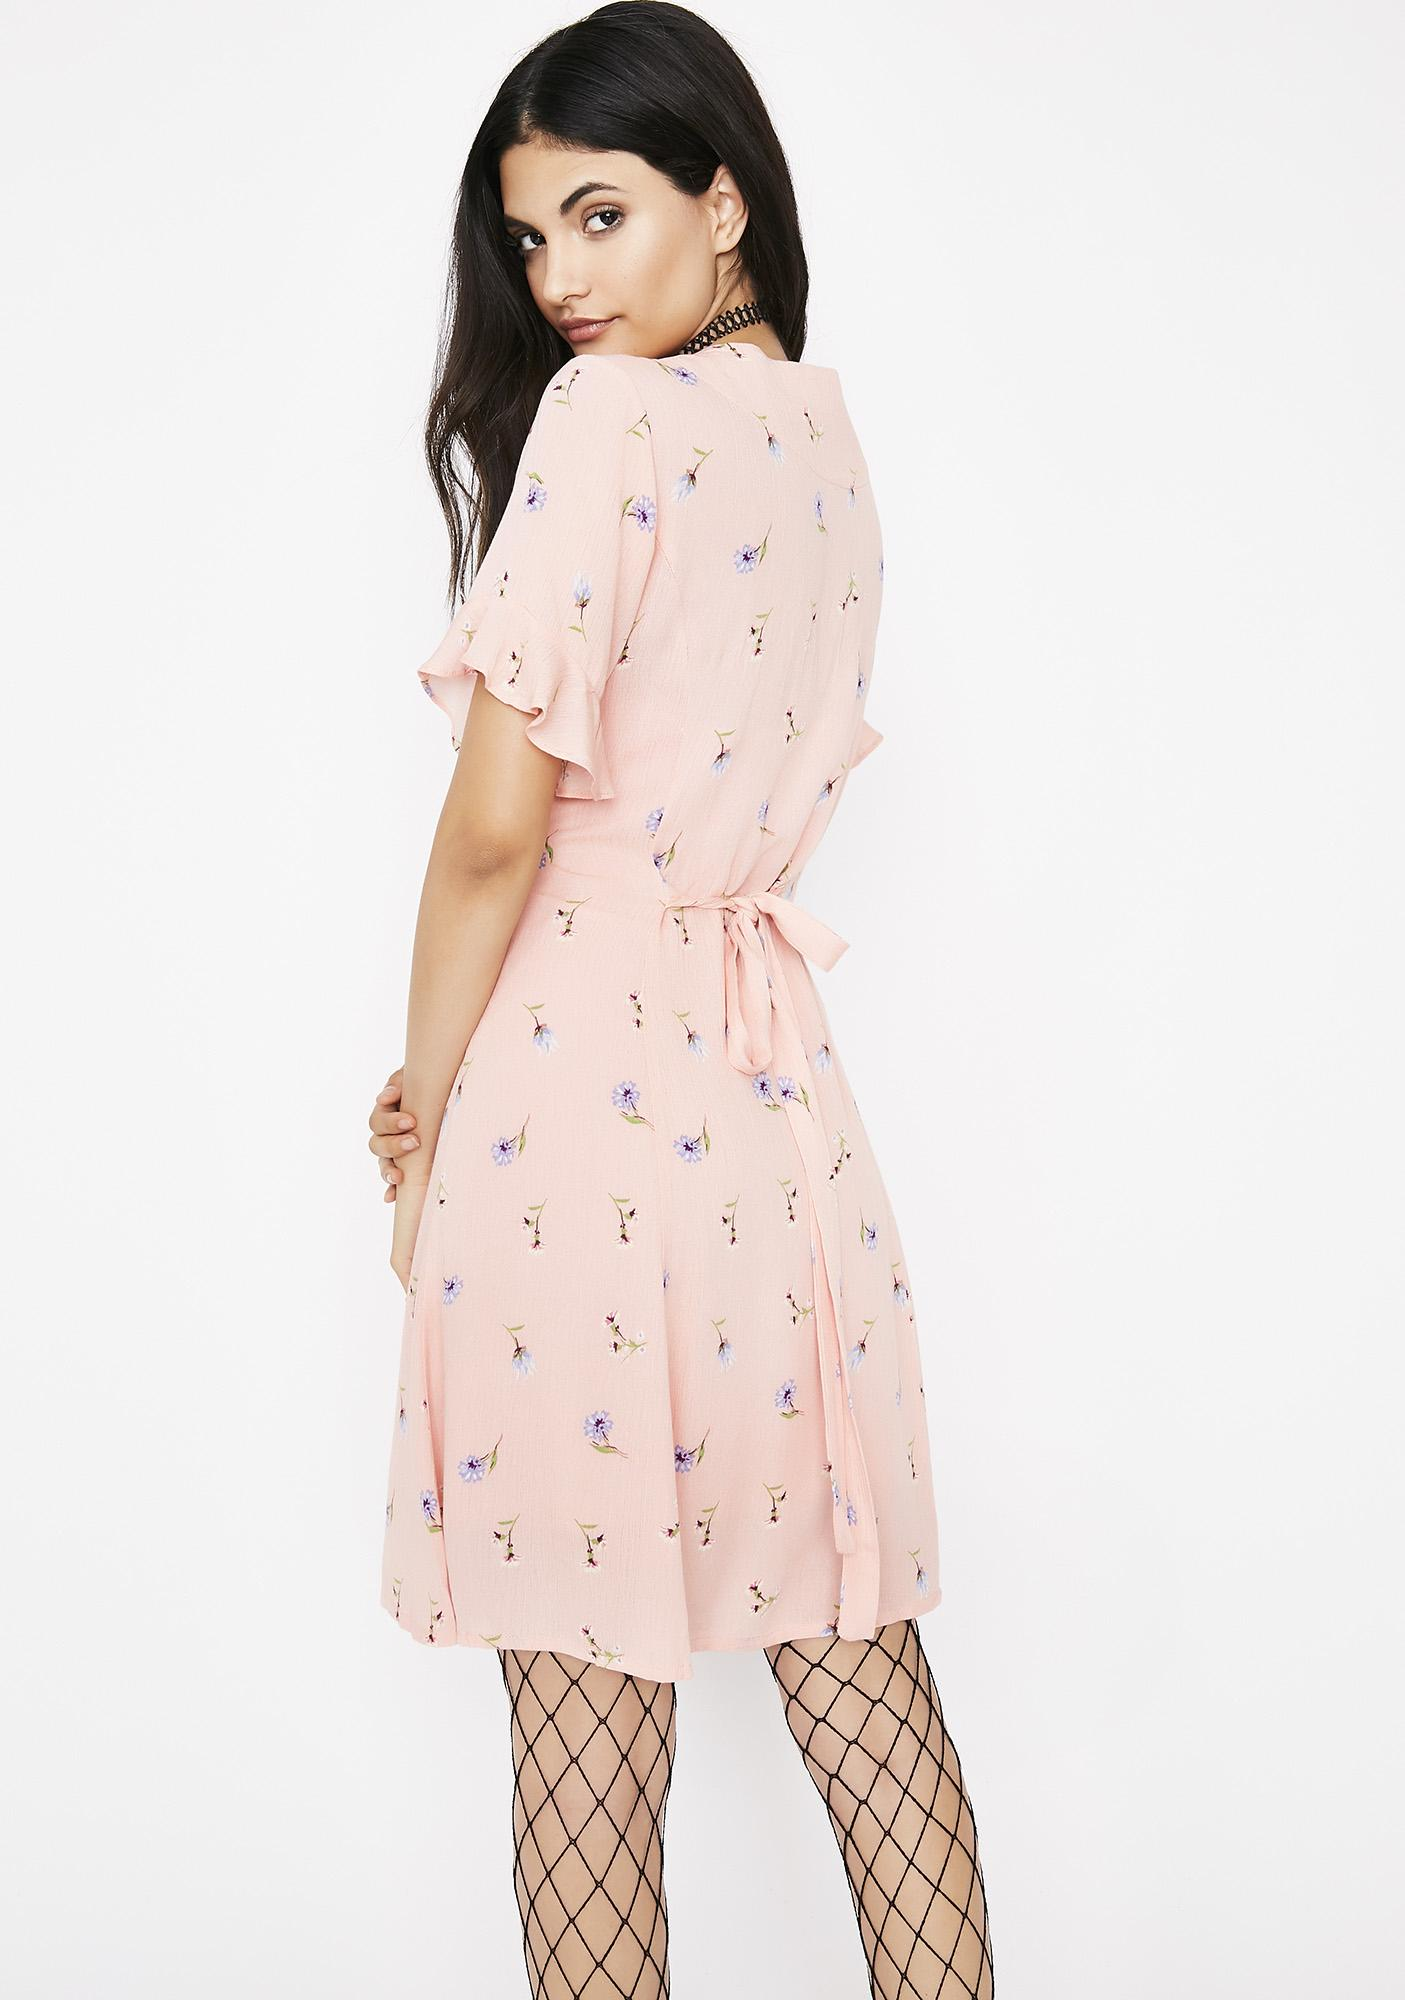 Flirty Fairy Flower Dress